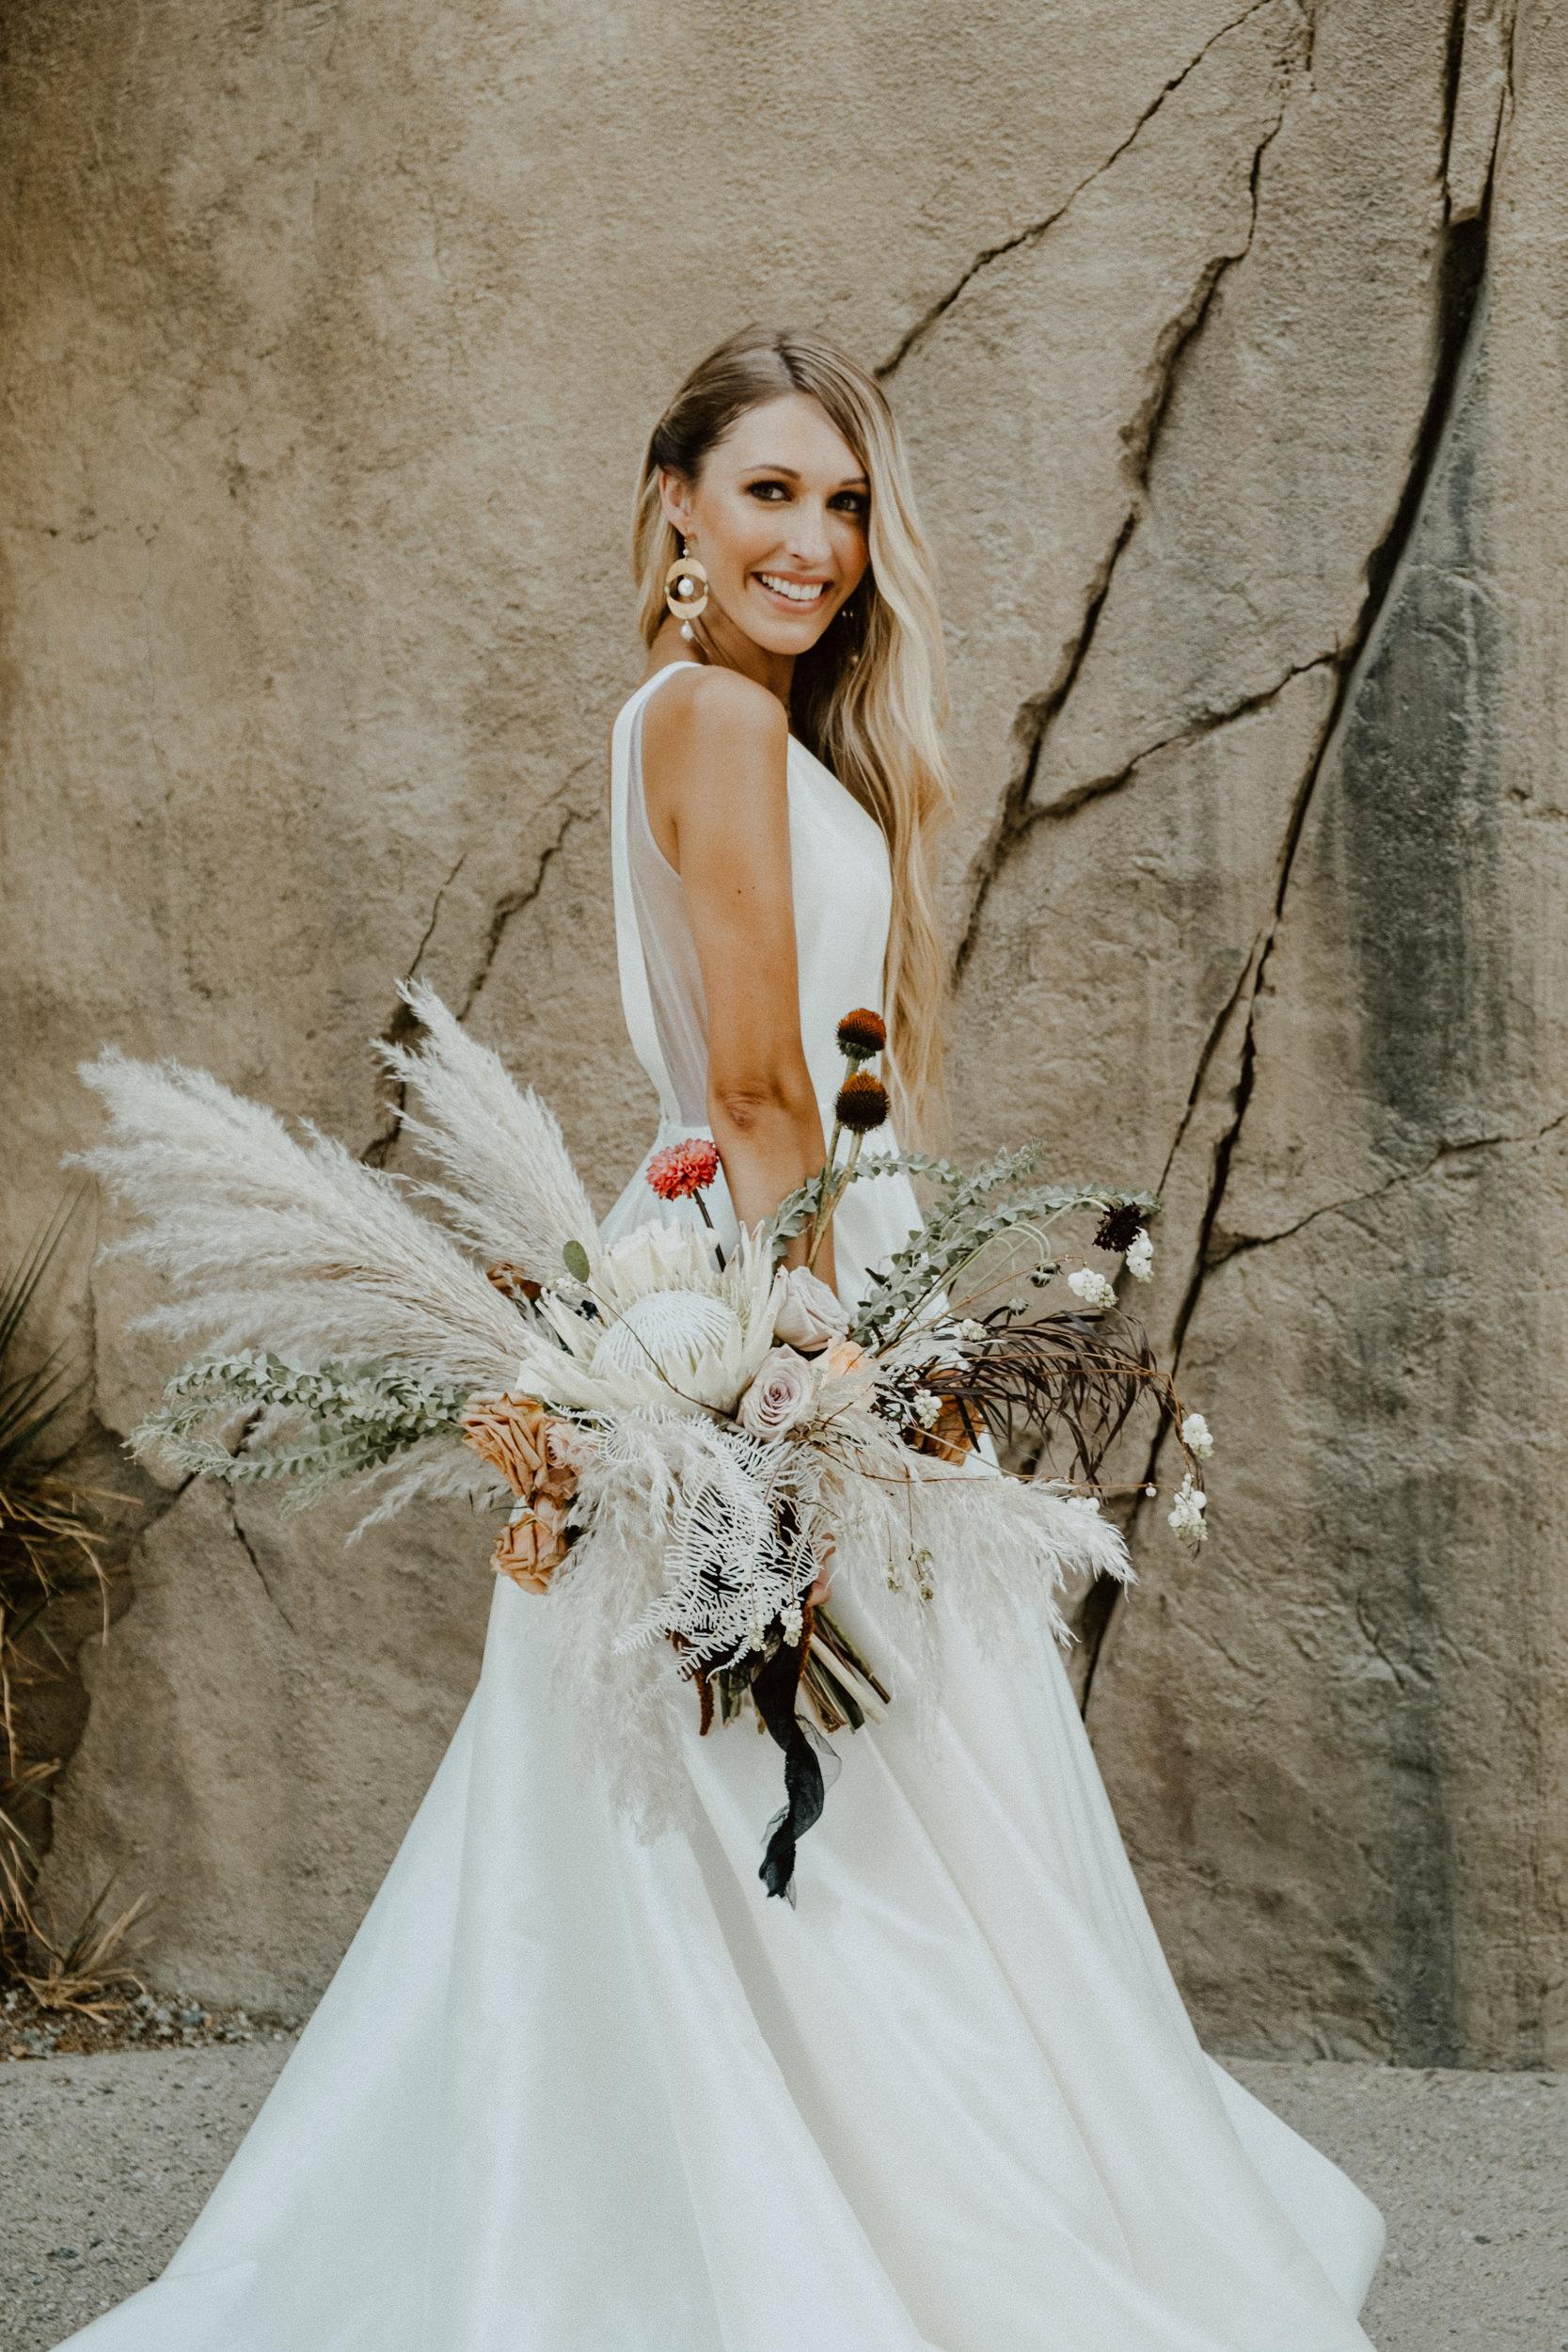 sChelsie + Chris - The Desert Shootout Wedding Romantics at The Living Desert-23.jpg